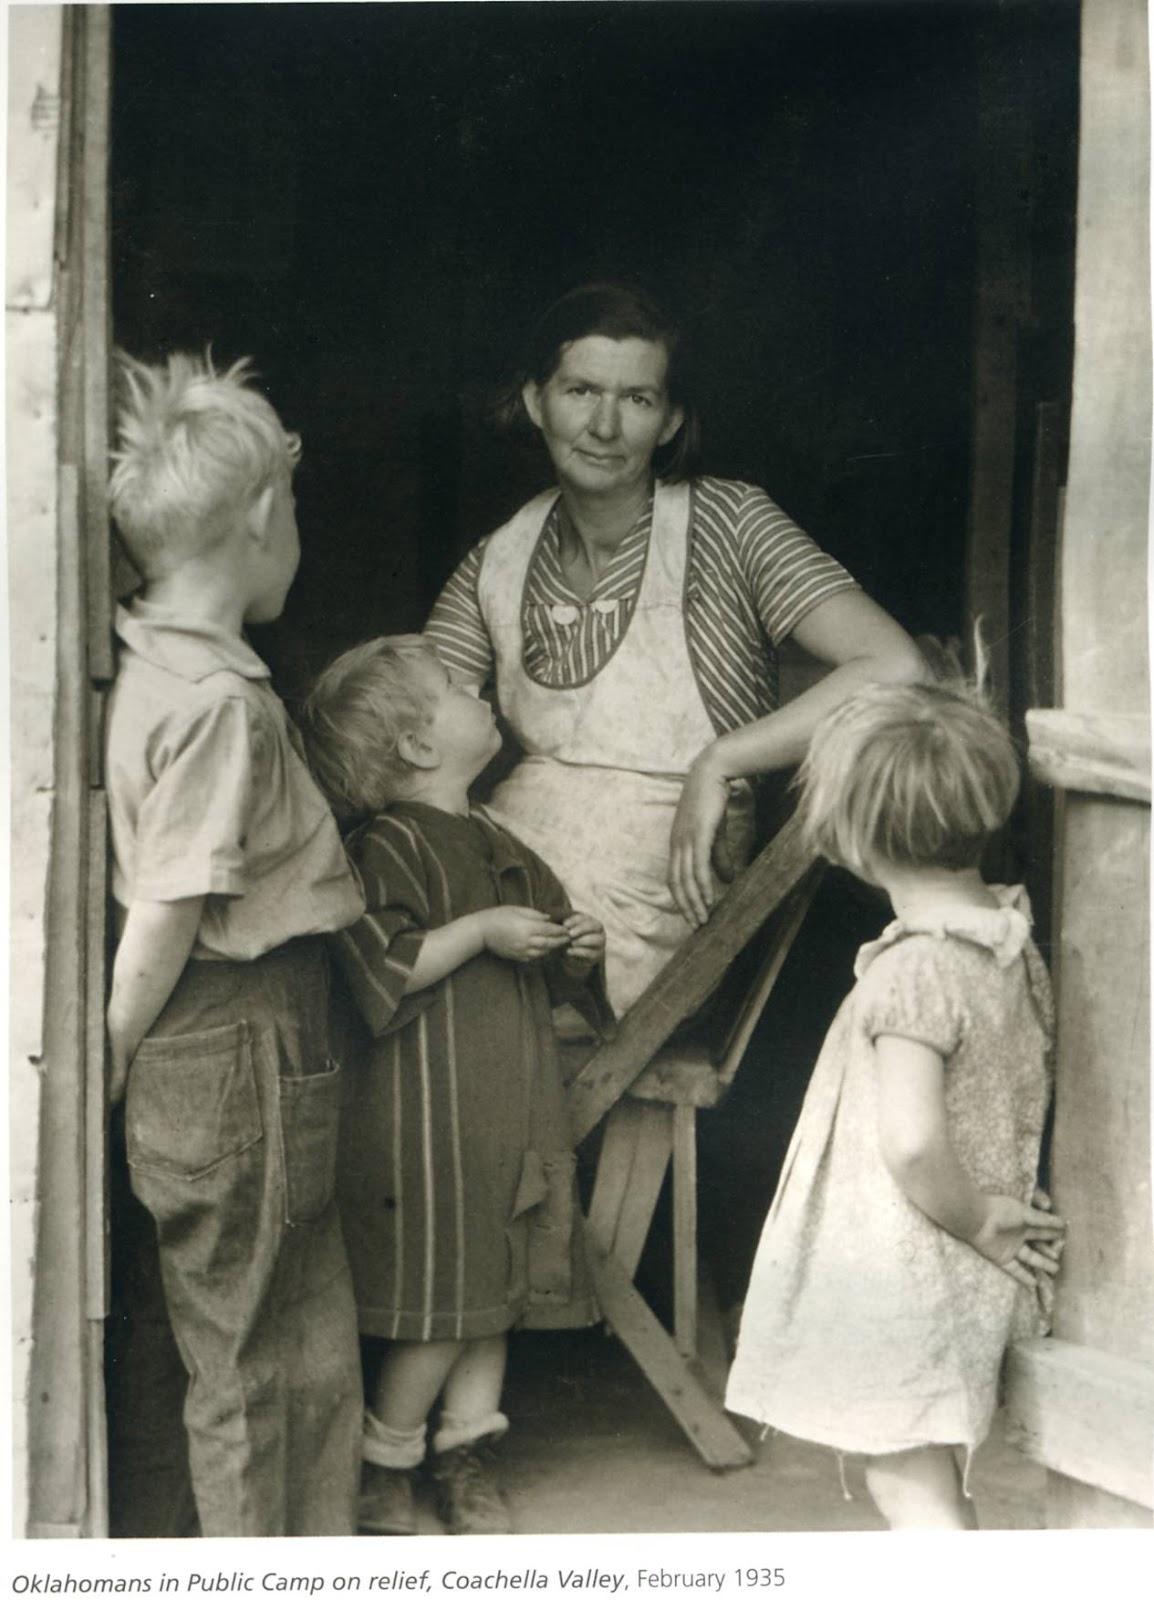 a biography of dorothea lange an american documentary photographer Dorothea lange (1895-1965), american documentary photographer and  photojournalist, was born dorothea margarette nutzhorn in hoboken, new  jersey.